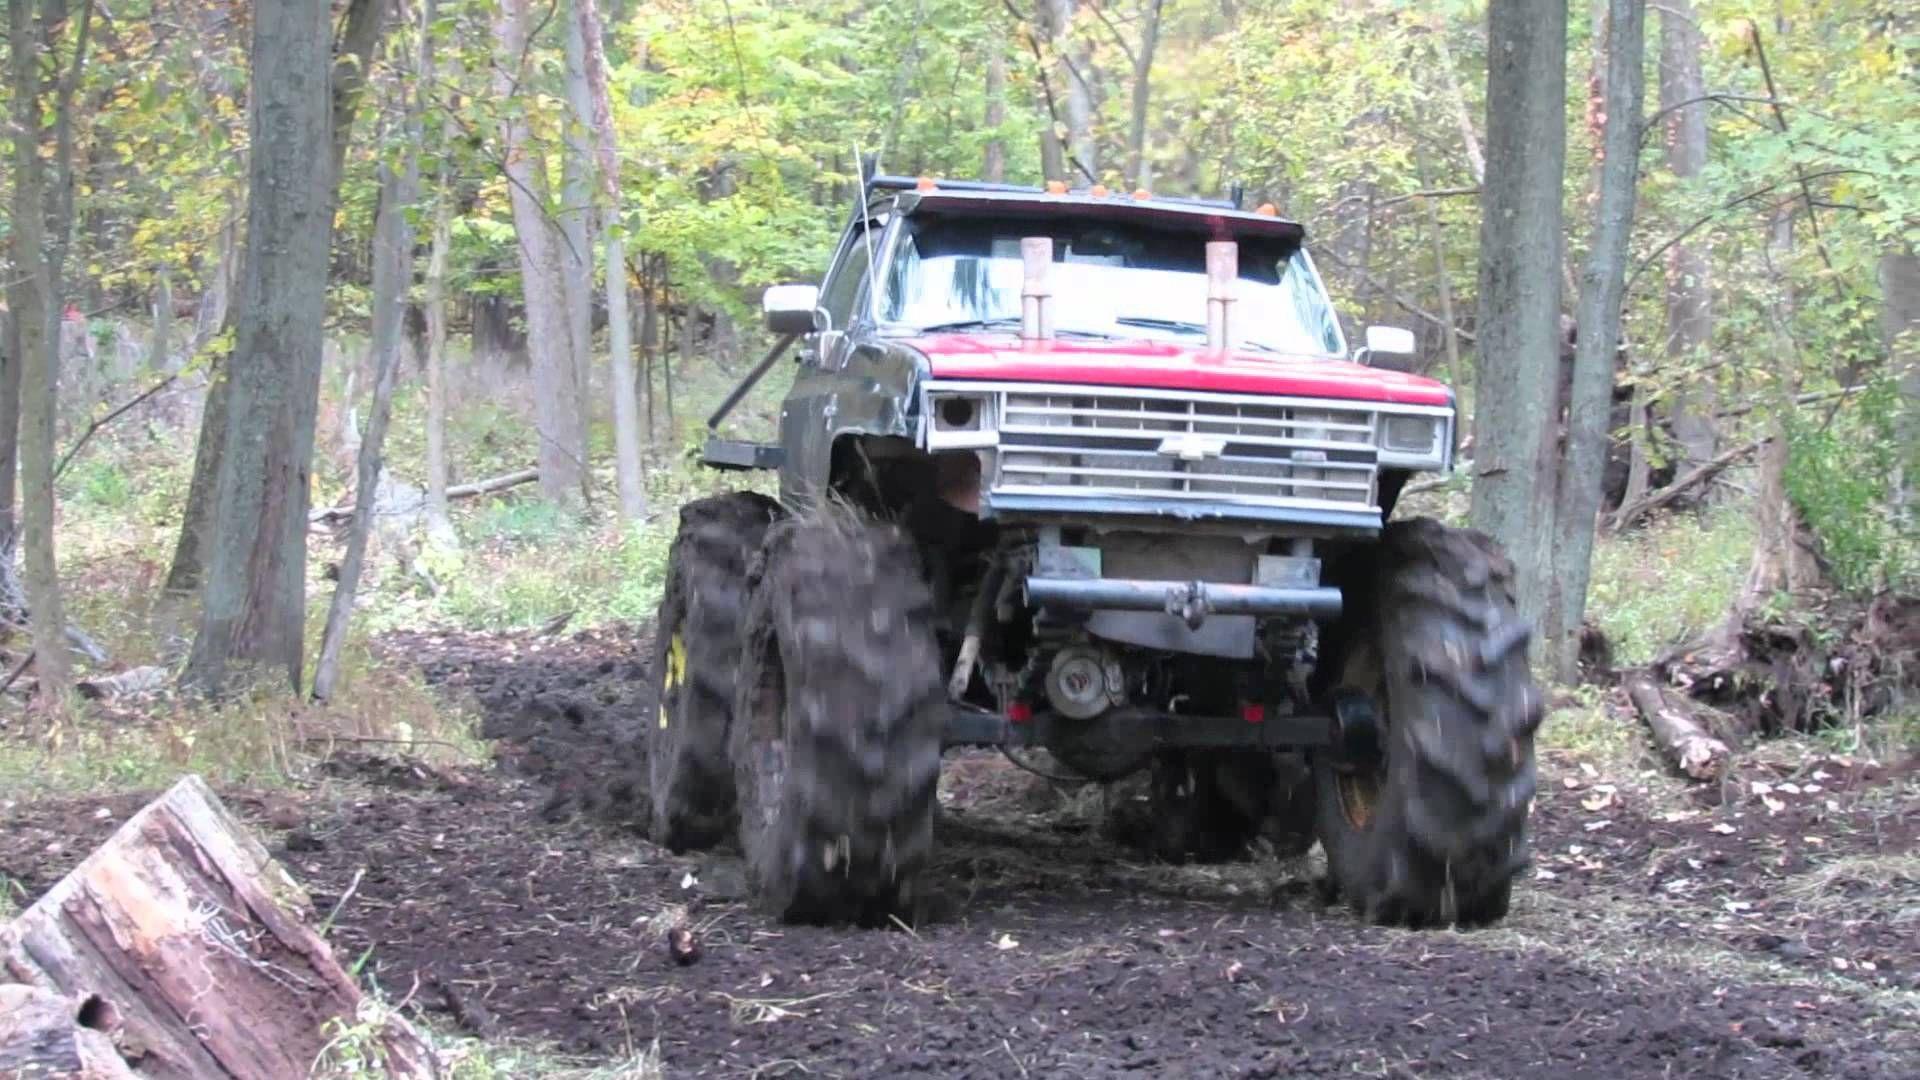 Mud Trucks Wallpaper Free For Desktop Wallpaper Background On Car